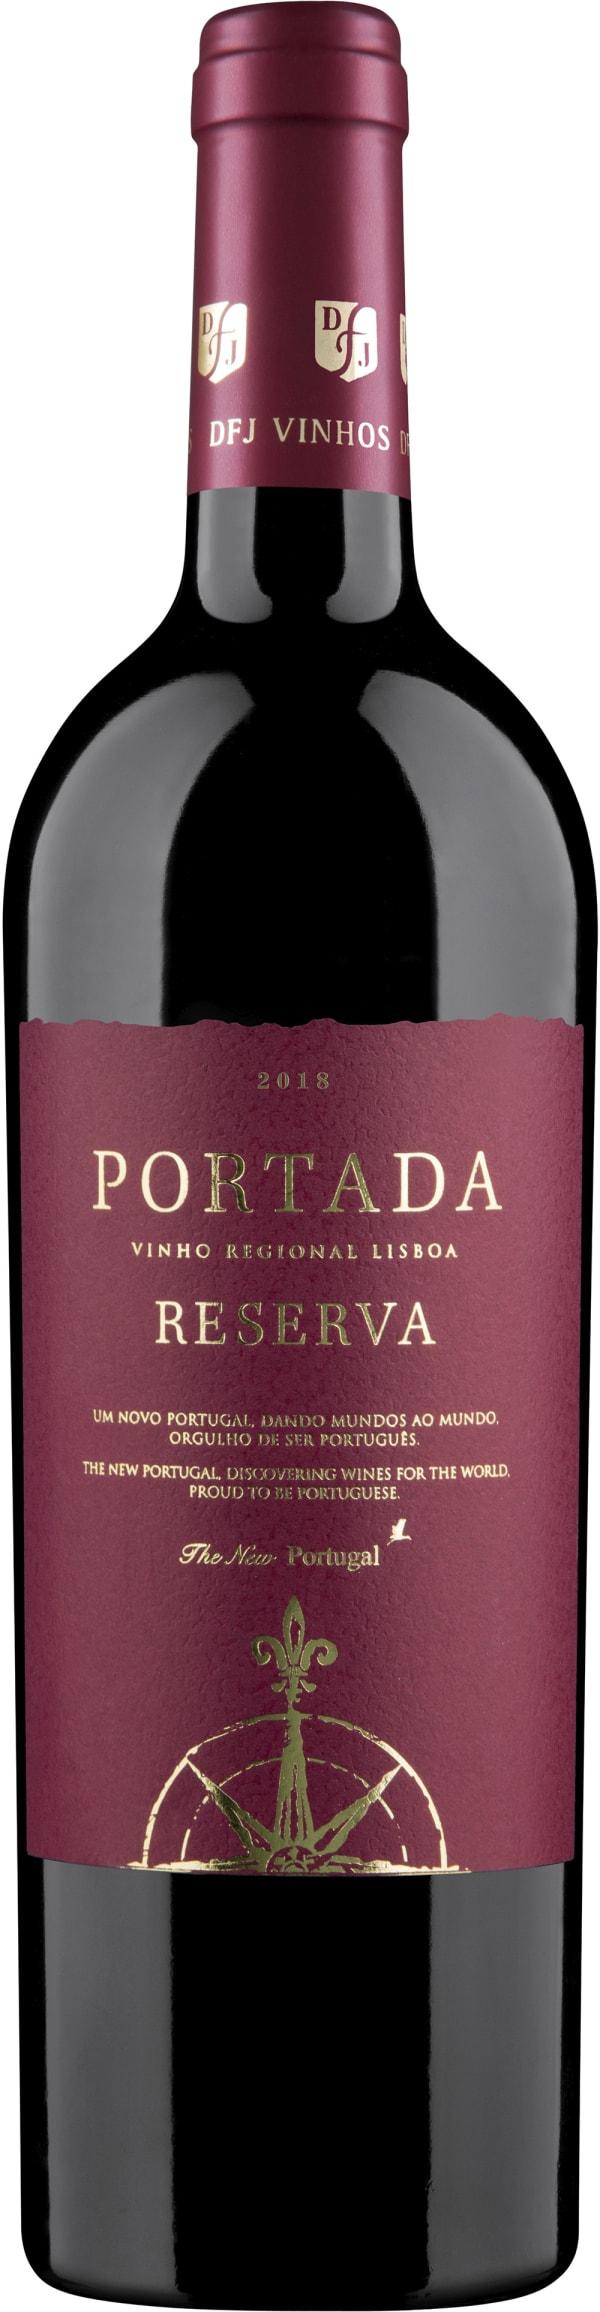 Portada Reserva Red 2018